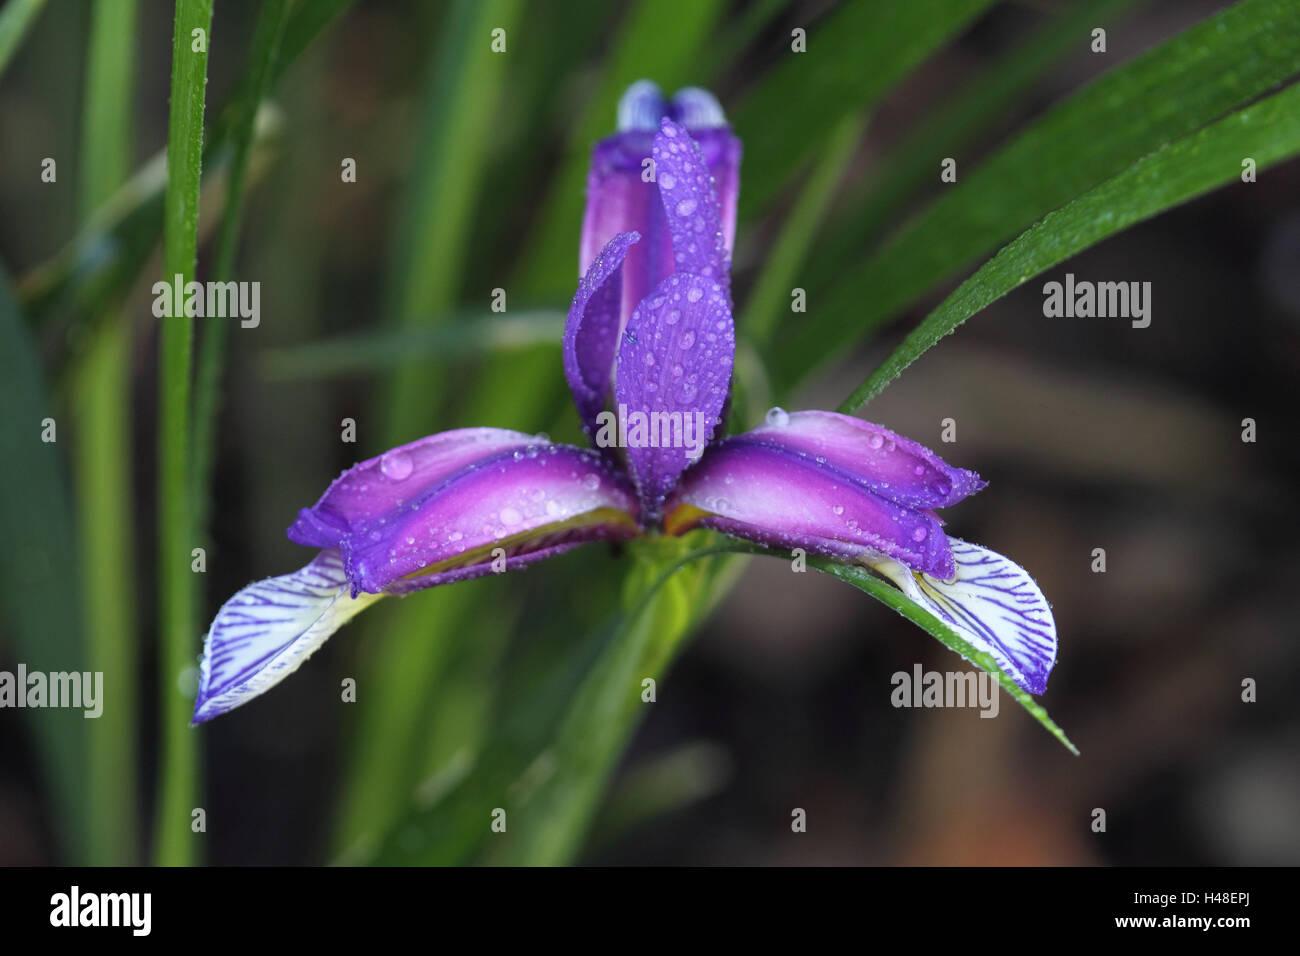 Crossbreed iris, blossom, flower, blossom, mauve, dewdrops, drops water, freshness, landscape format, plant, iris, - Stock Image